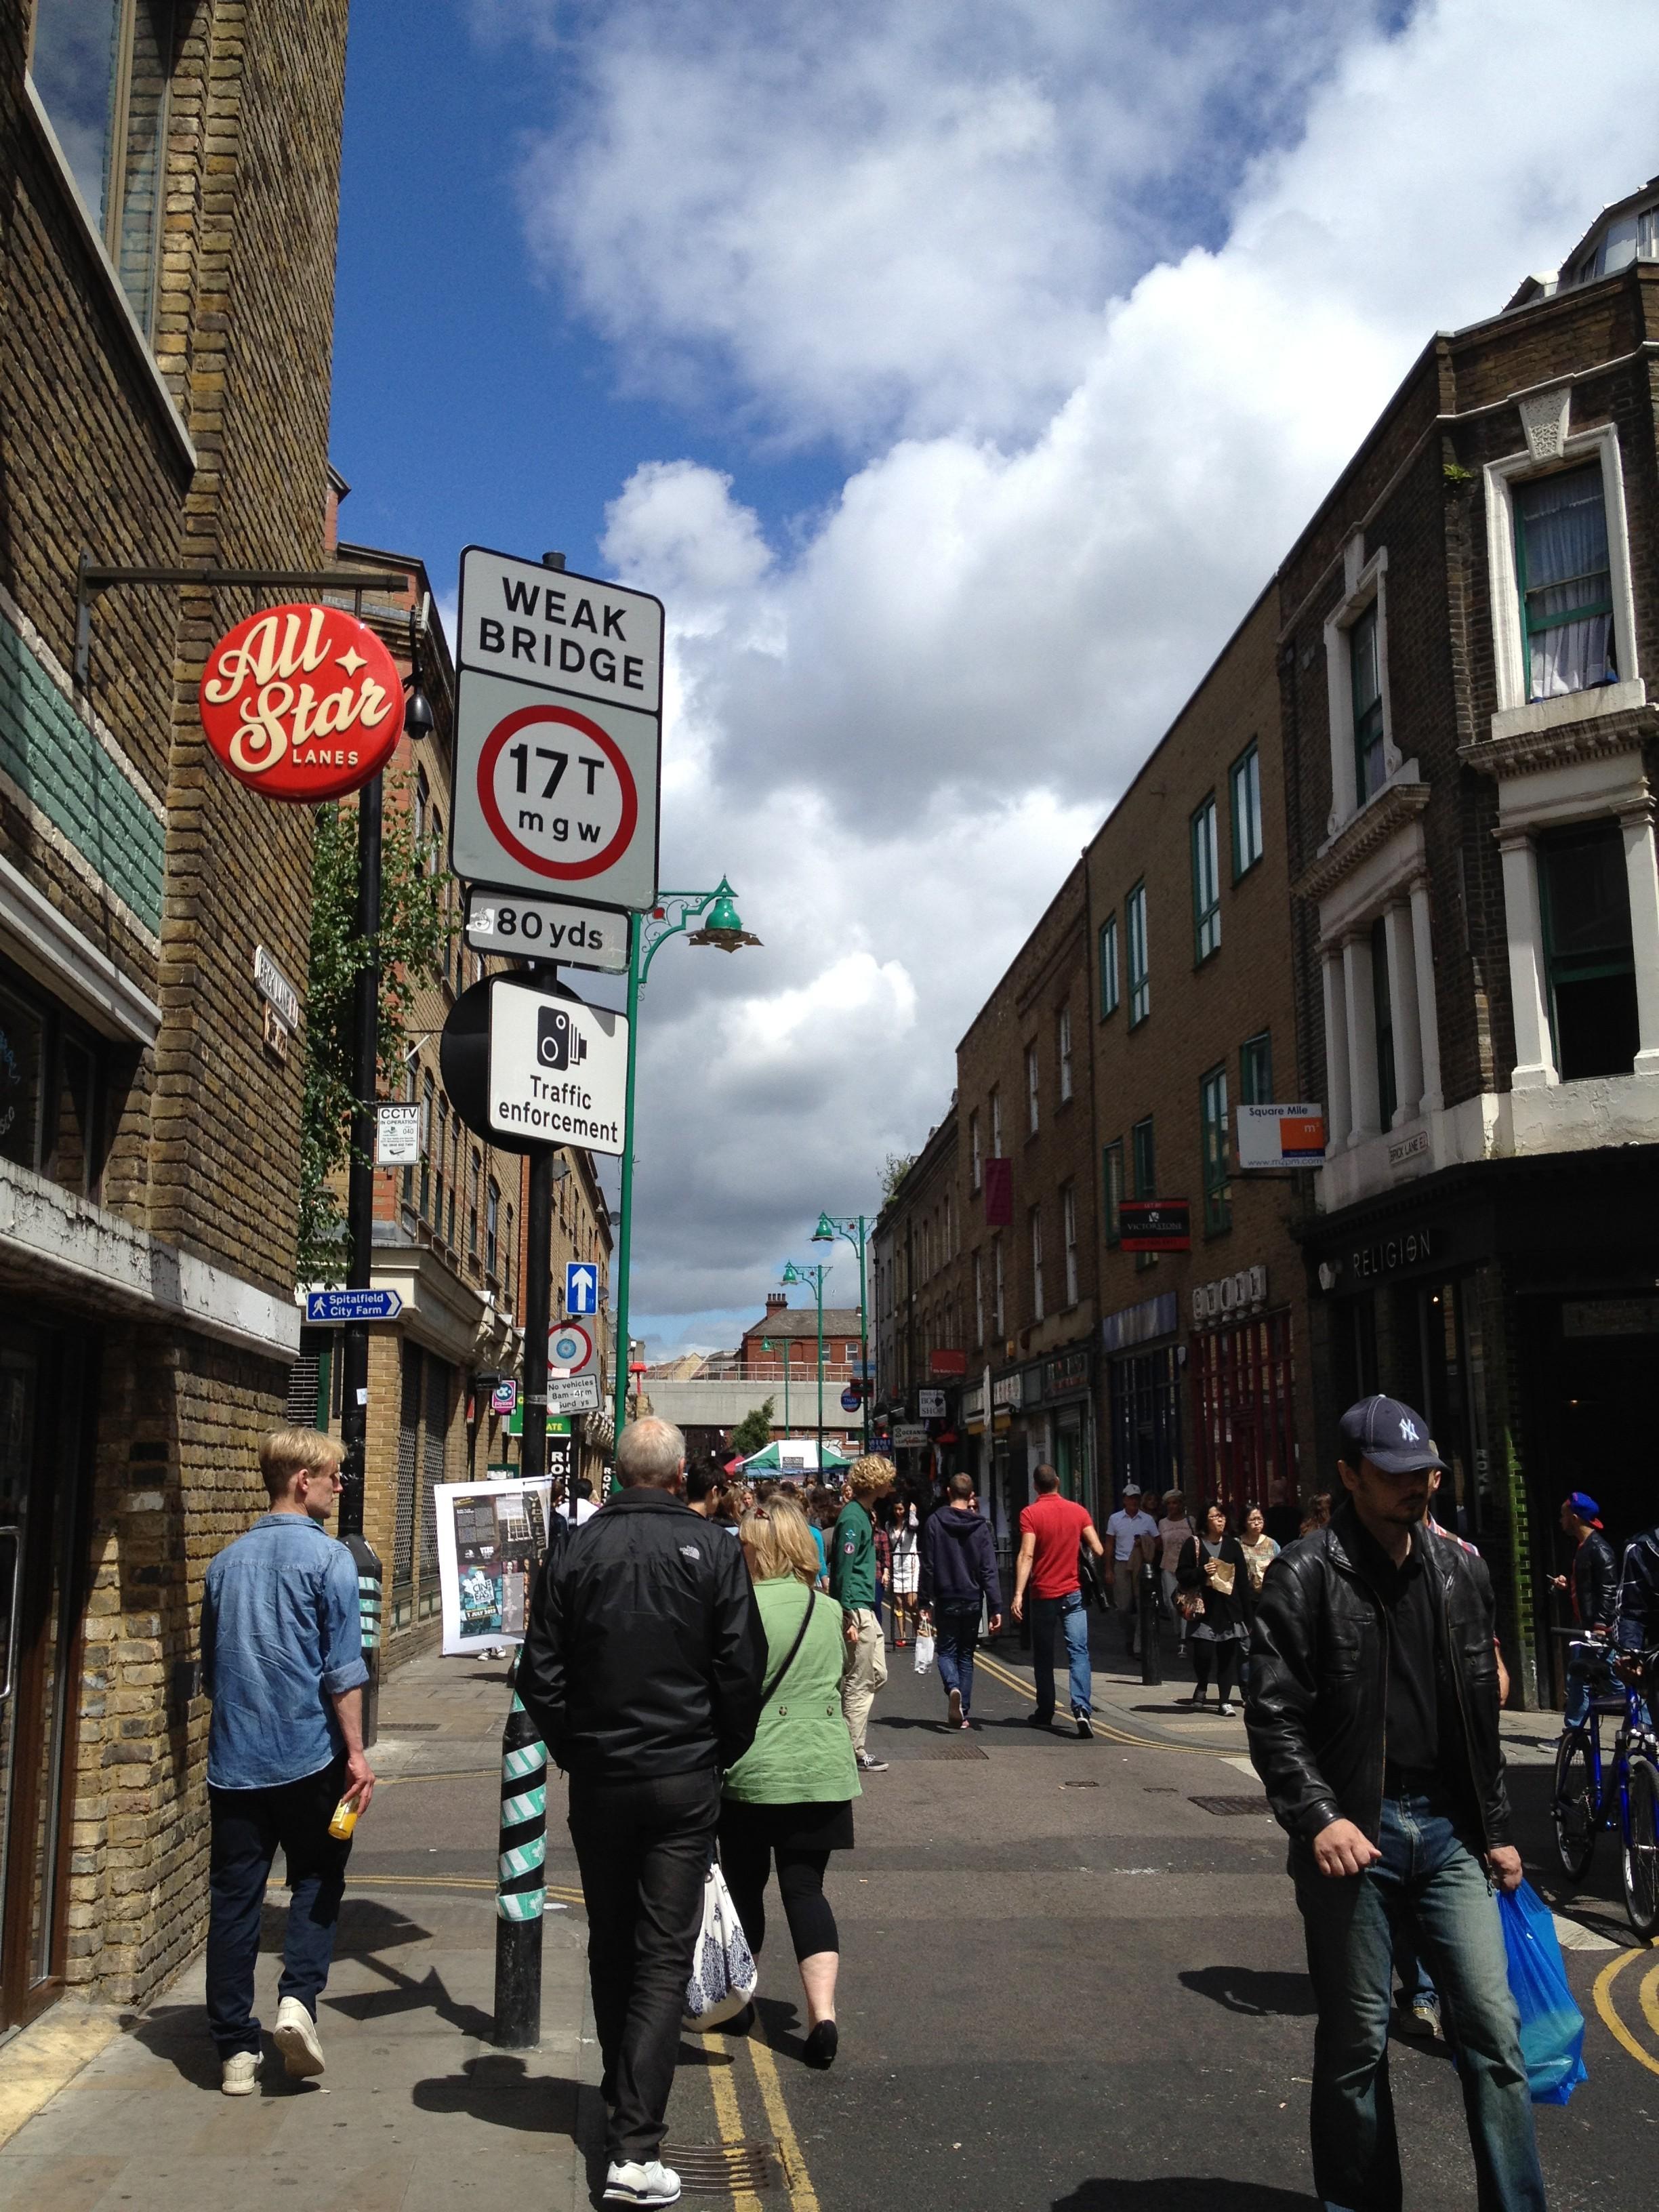 London, East End, pre-Olympics